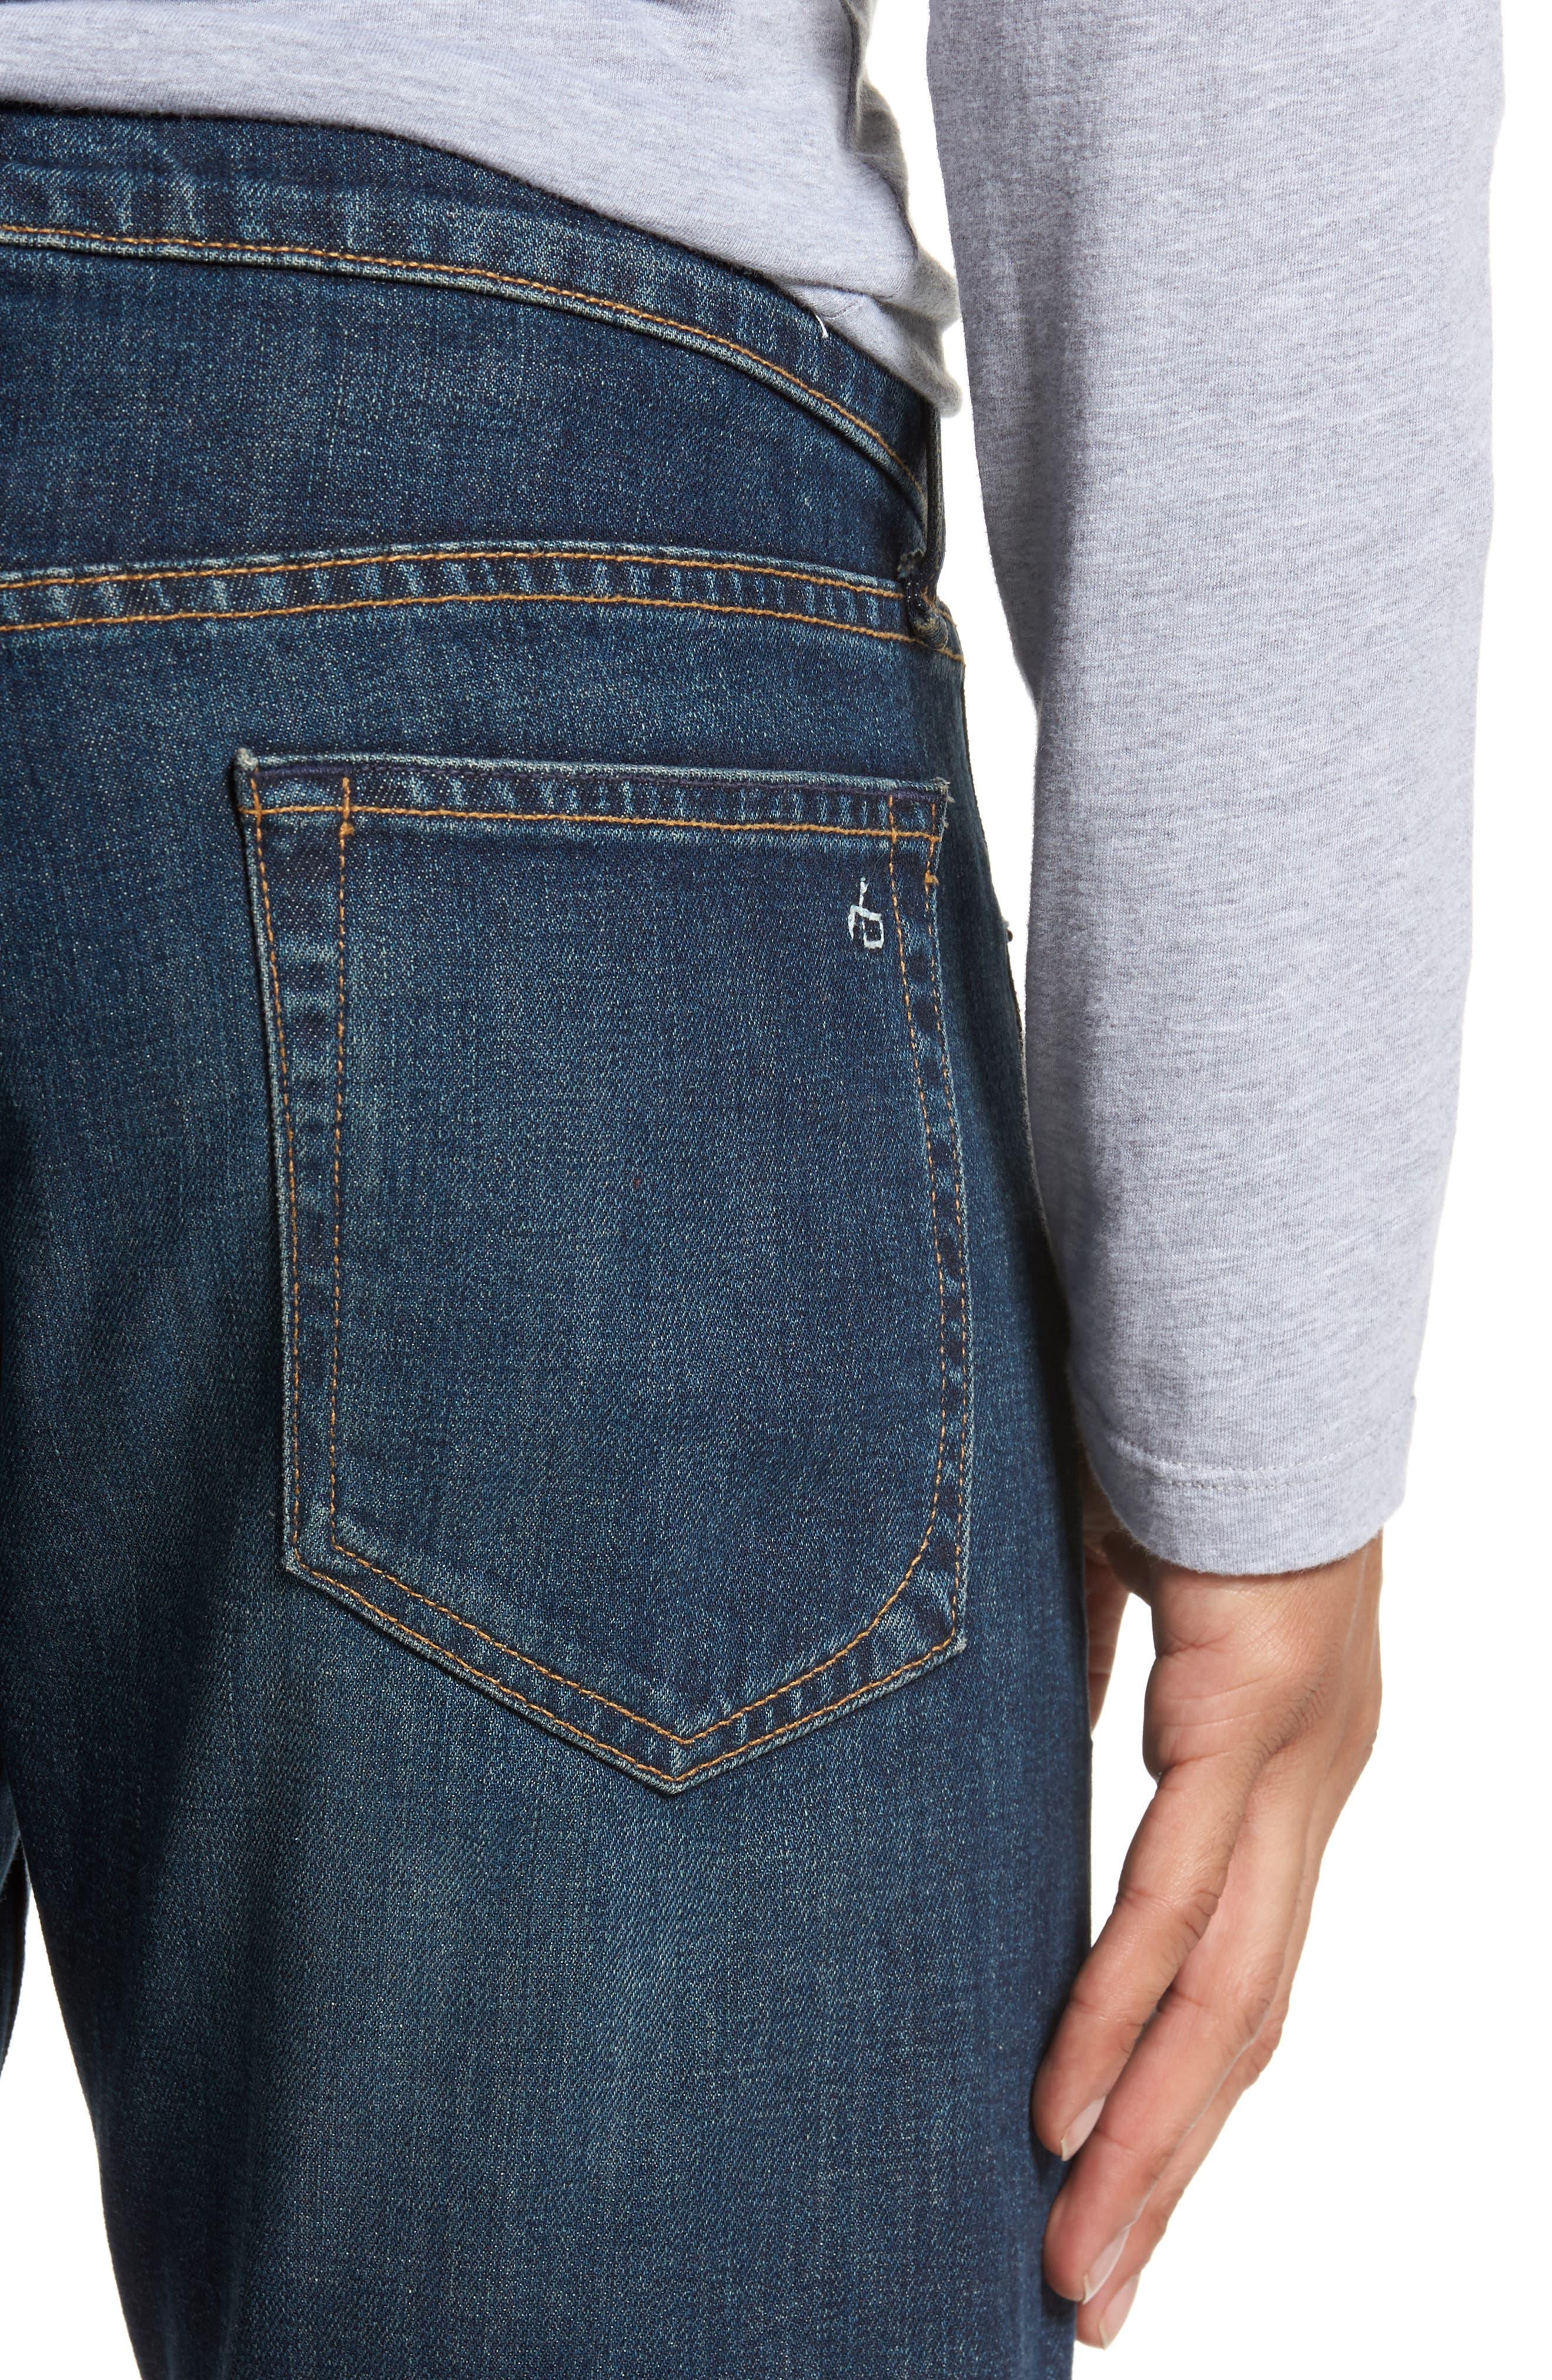 RAG & BONE,                             Fit 1 Skinny Fit Jeans,                             Alternate thumbnail 4, color,                             420